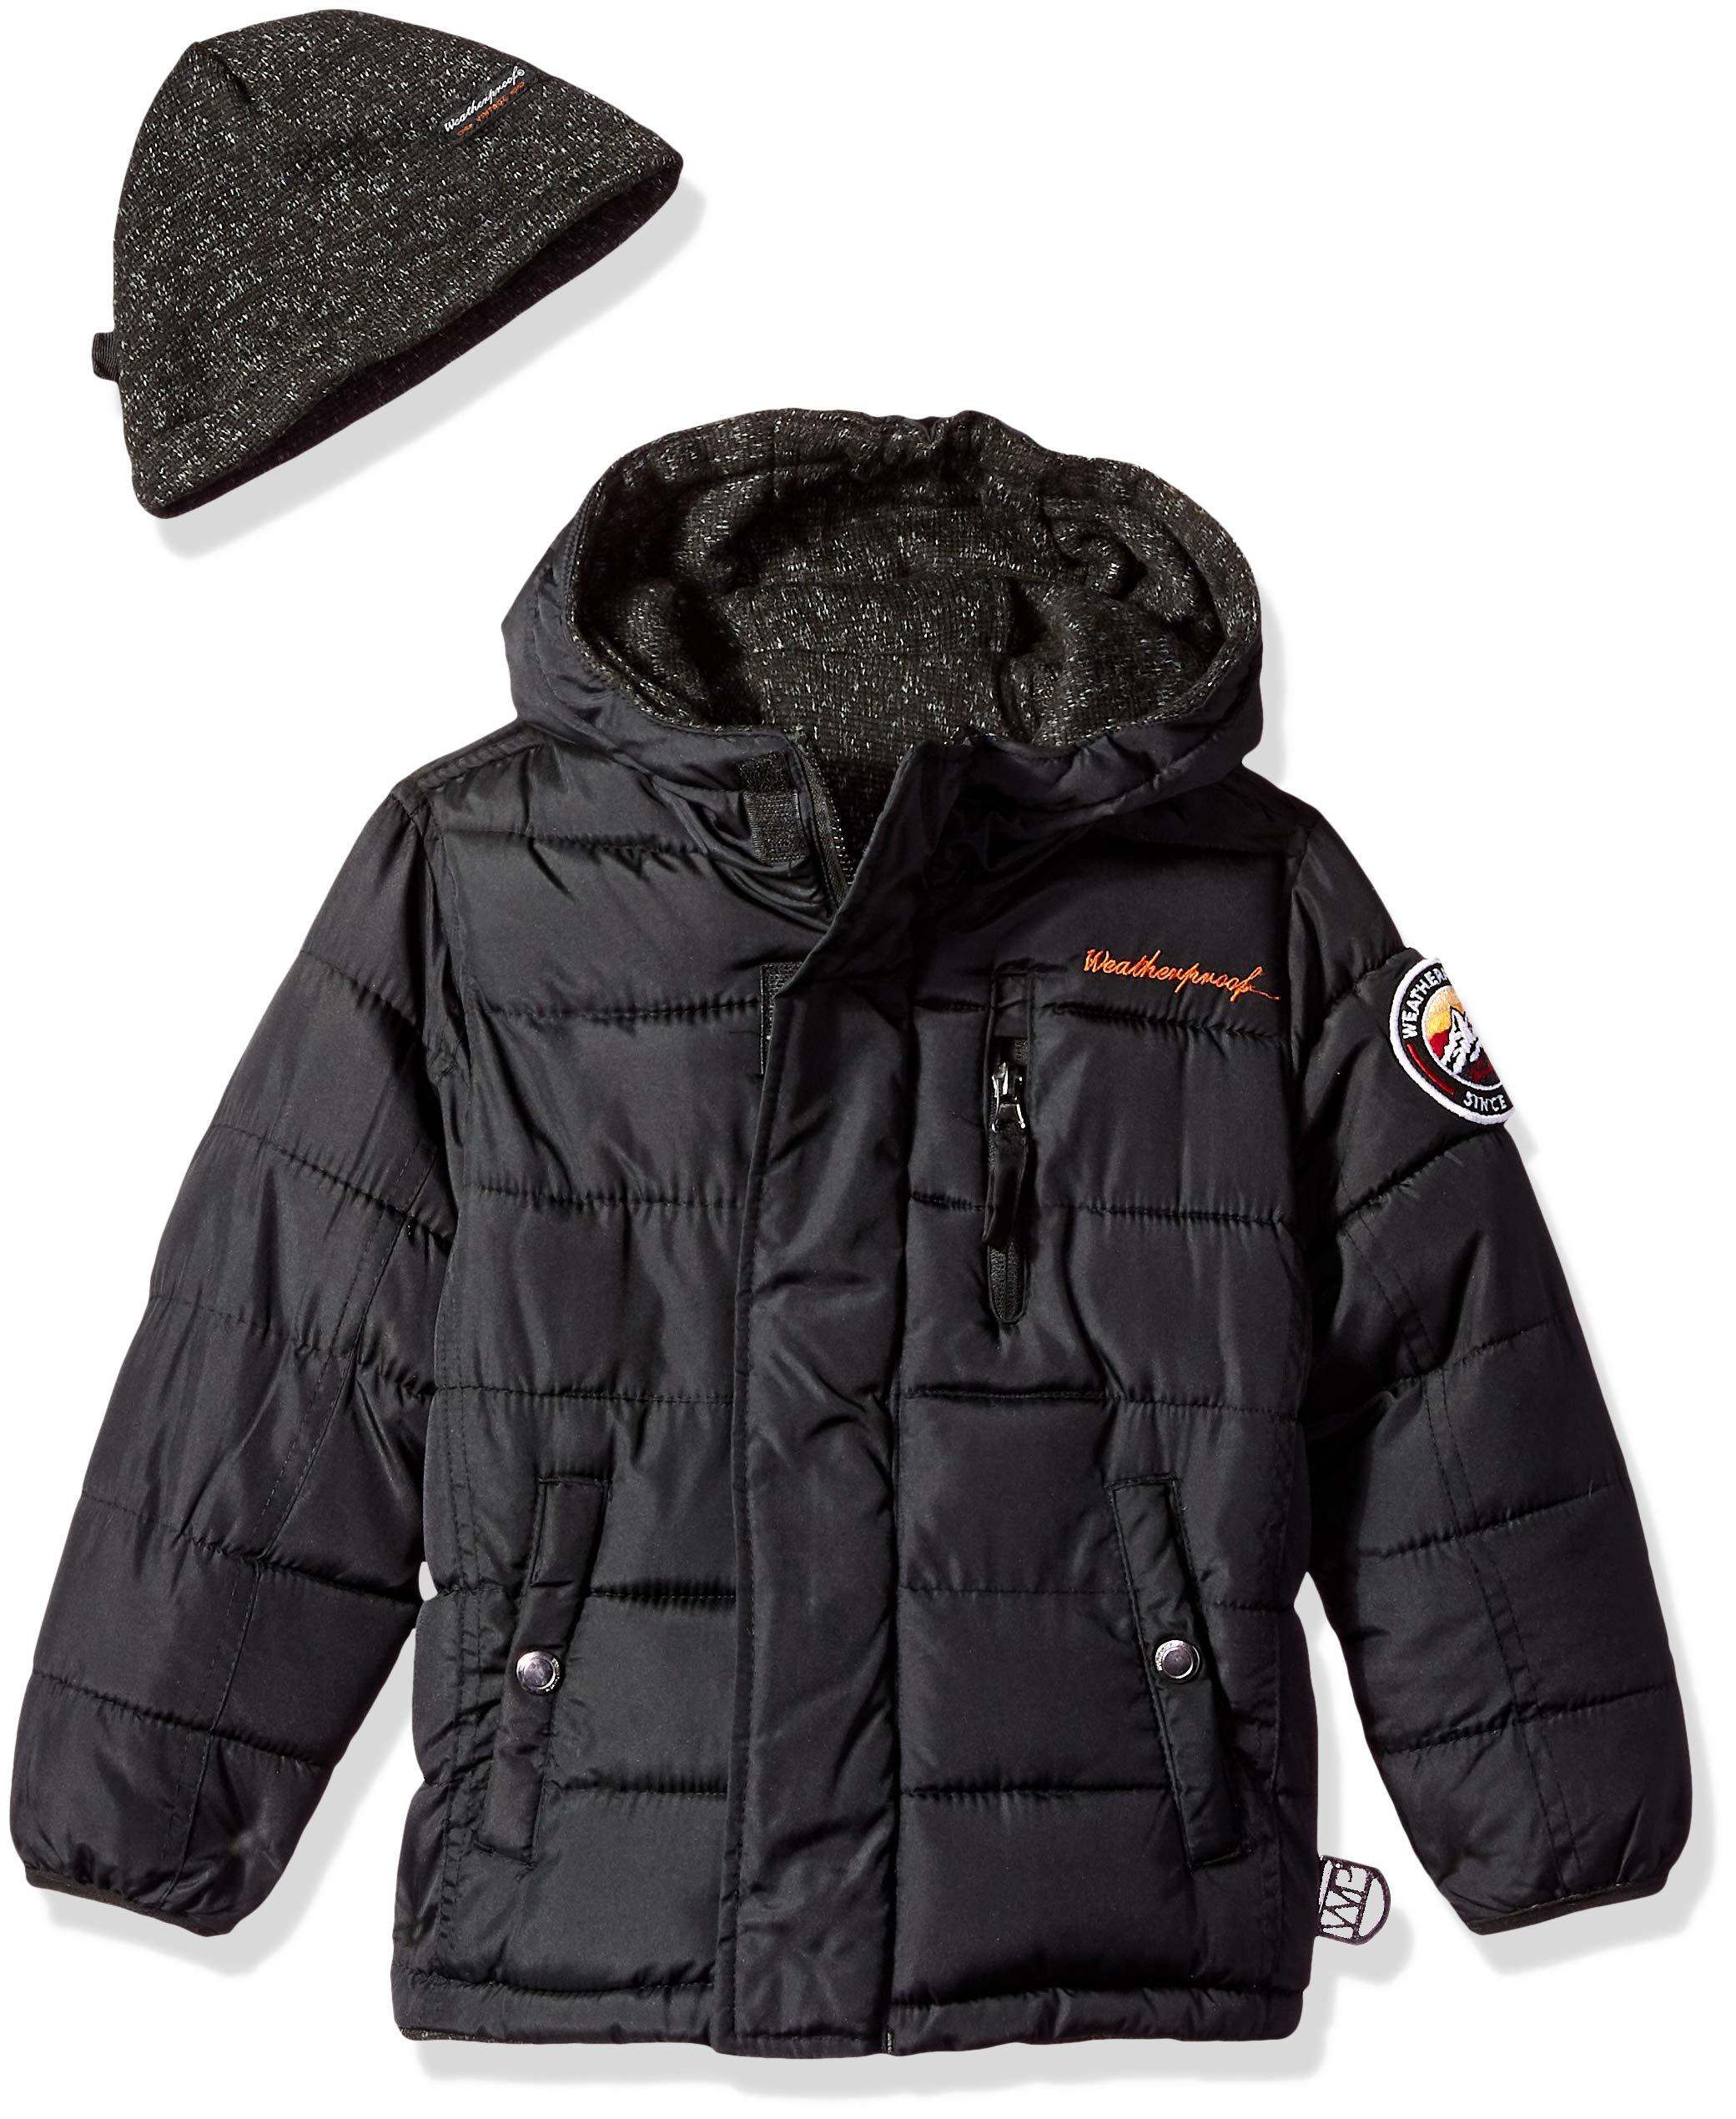 Weatherproof Boys Reversible to Sweater Fleece Jacket, Black, 14/16